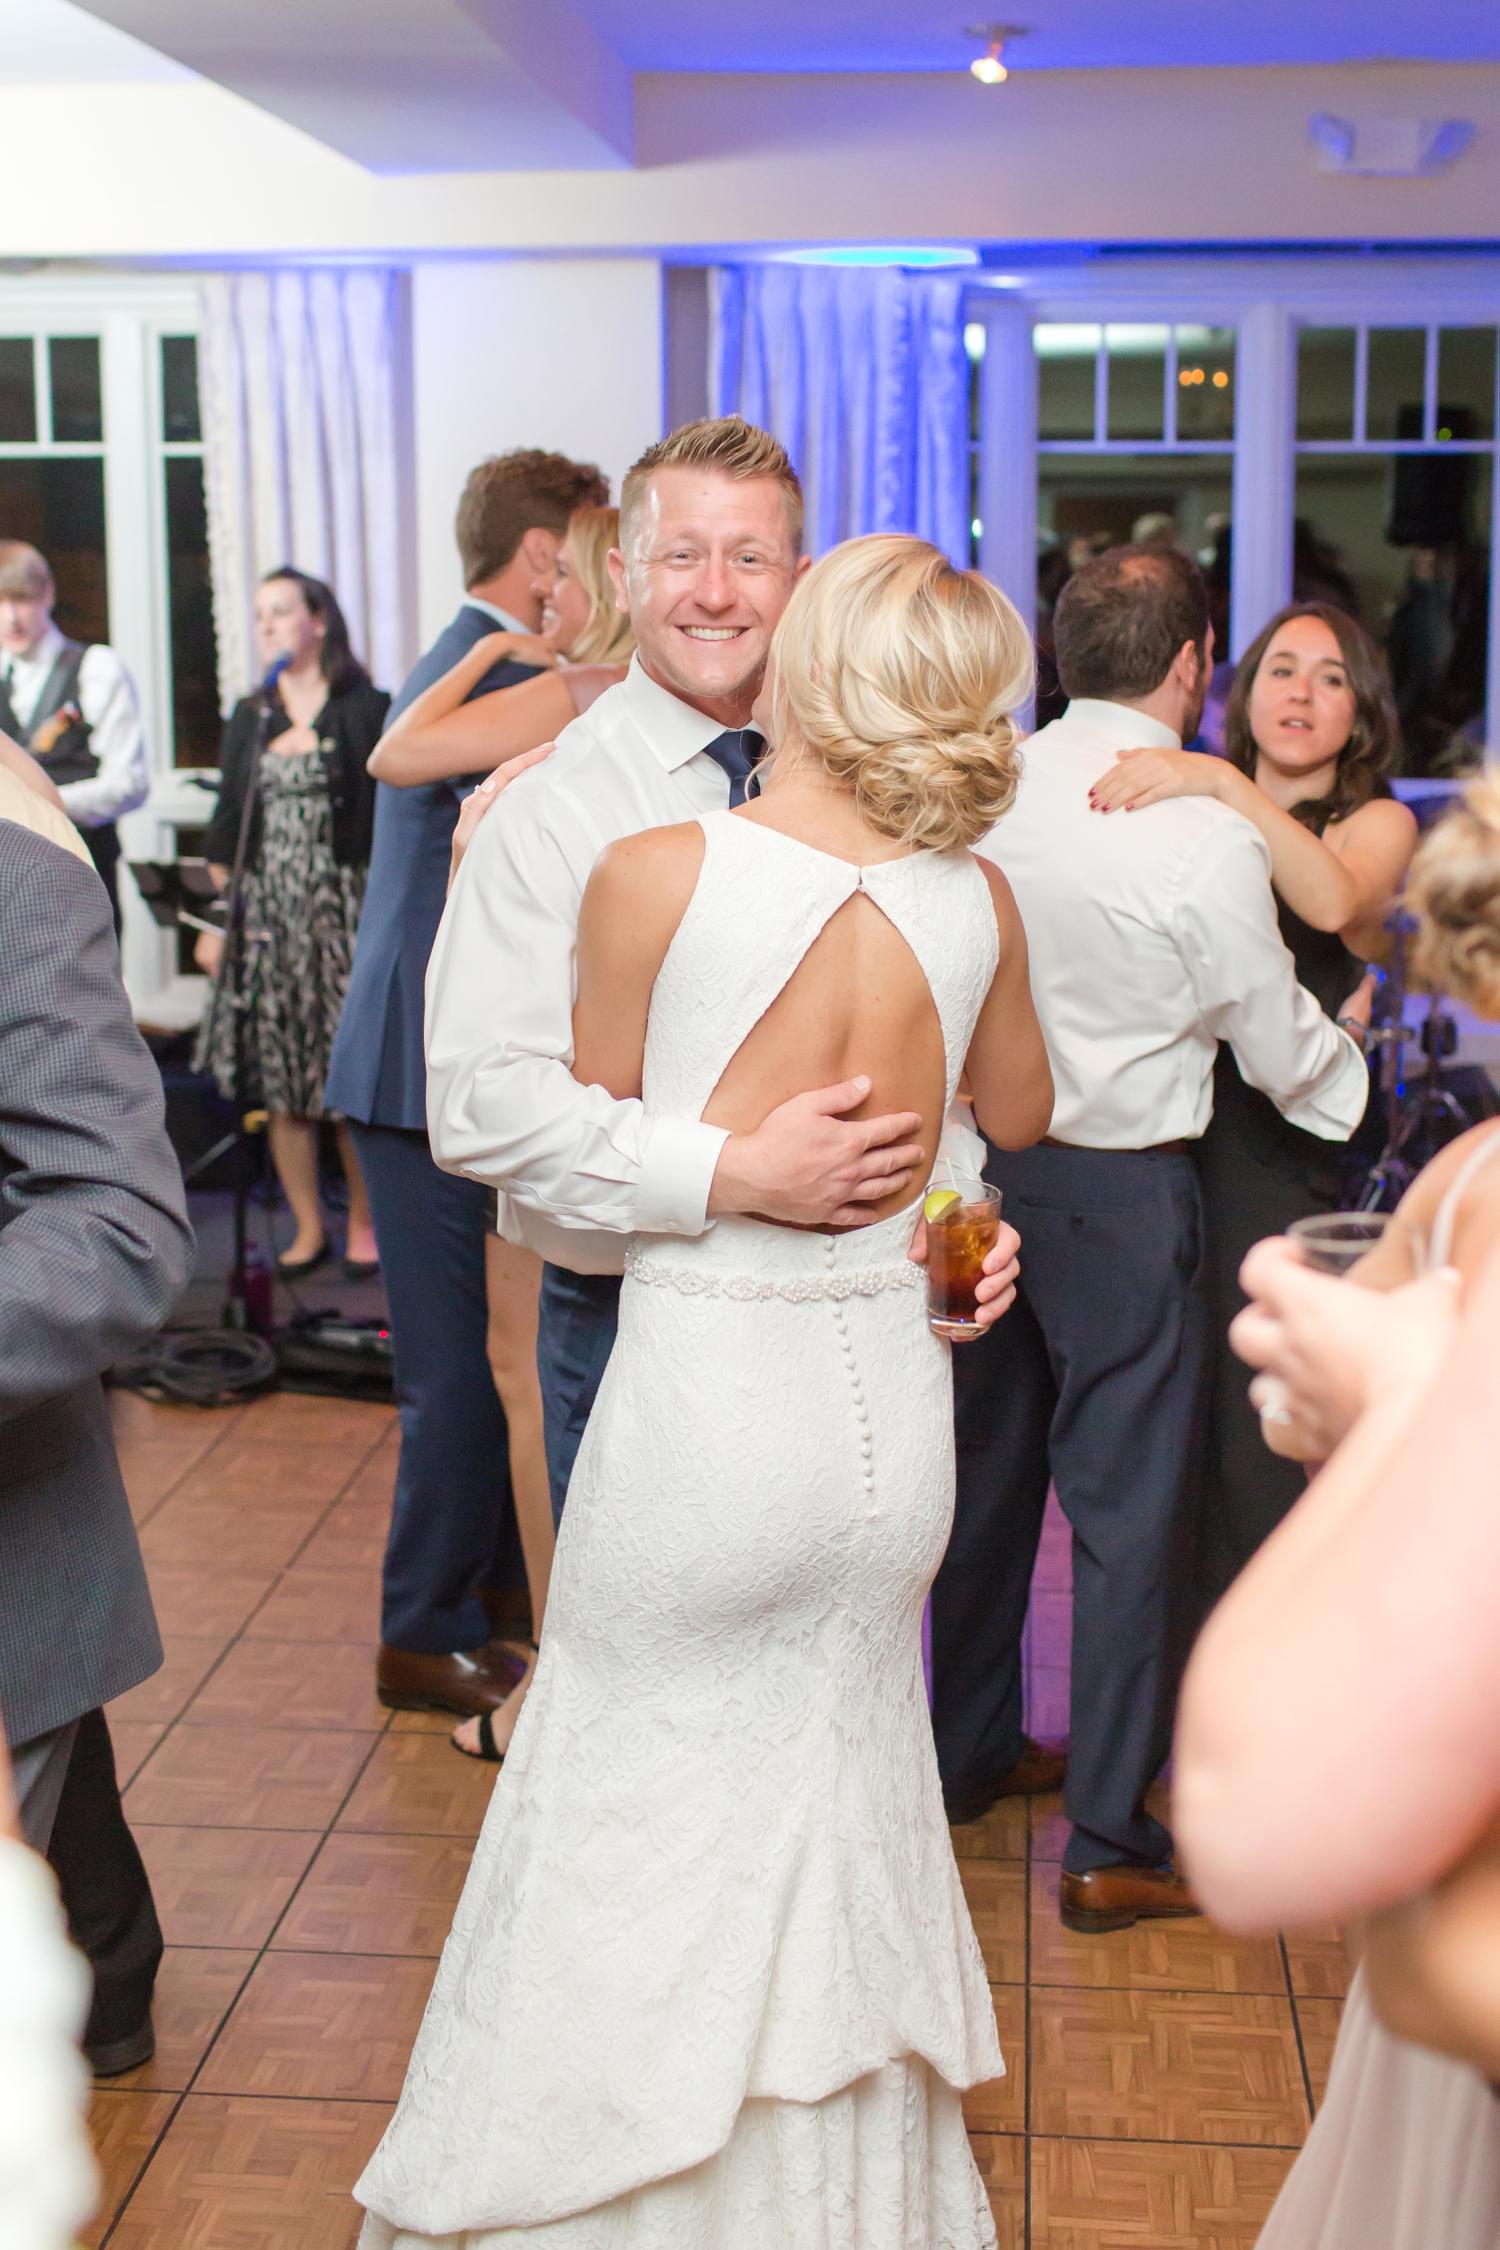 Wojciechowski Wedding-466_the-oaks-waterfront-inn-wedding-easton-maryland-wedding-photography-anna-grace-photography-photo.jpg